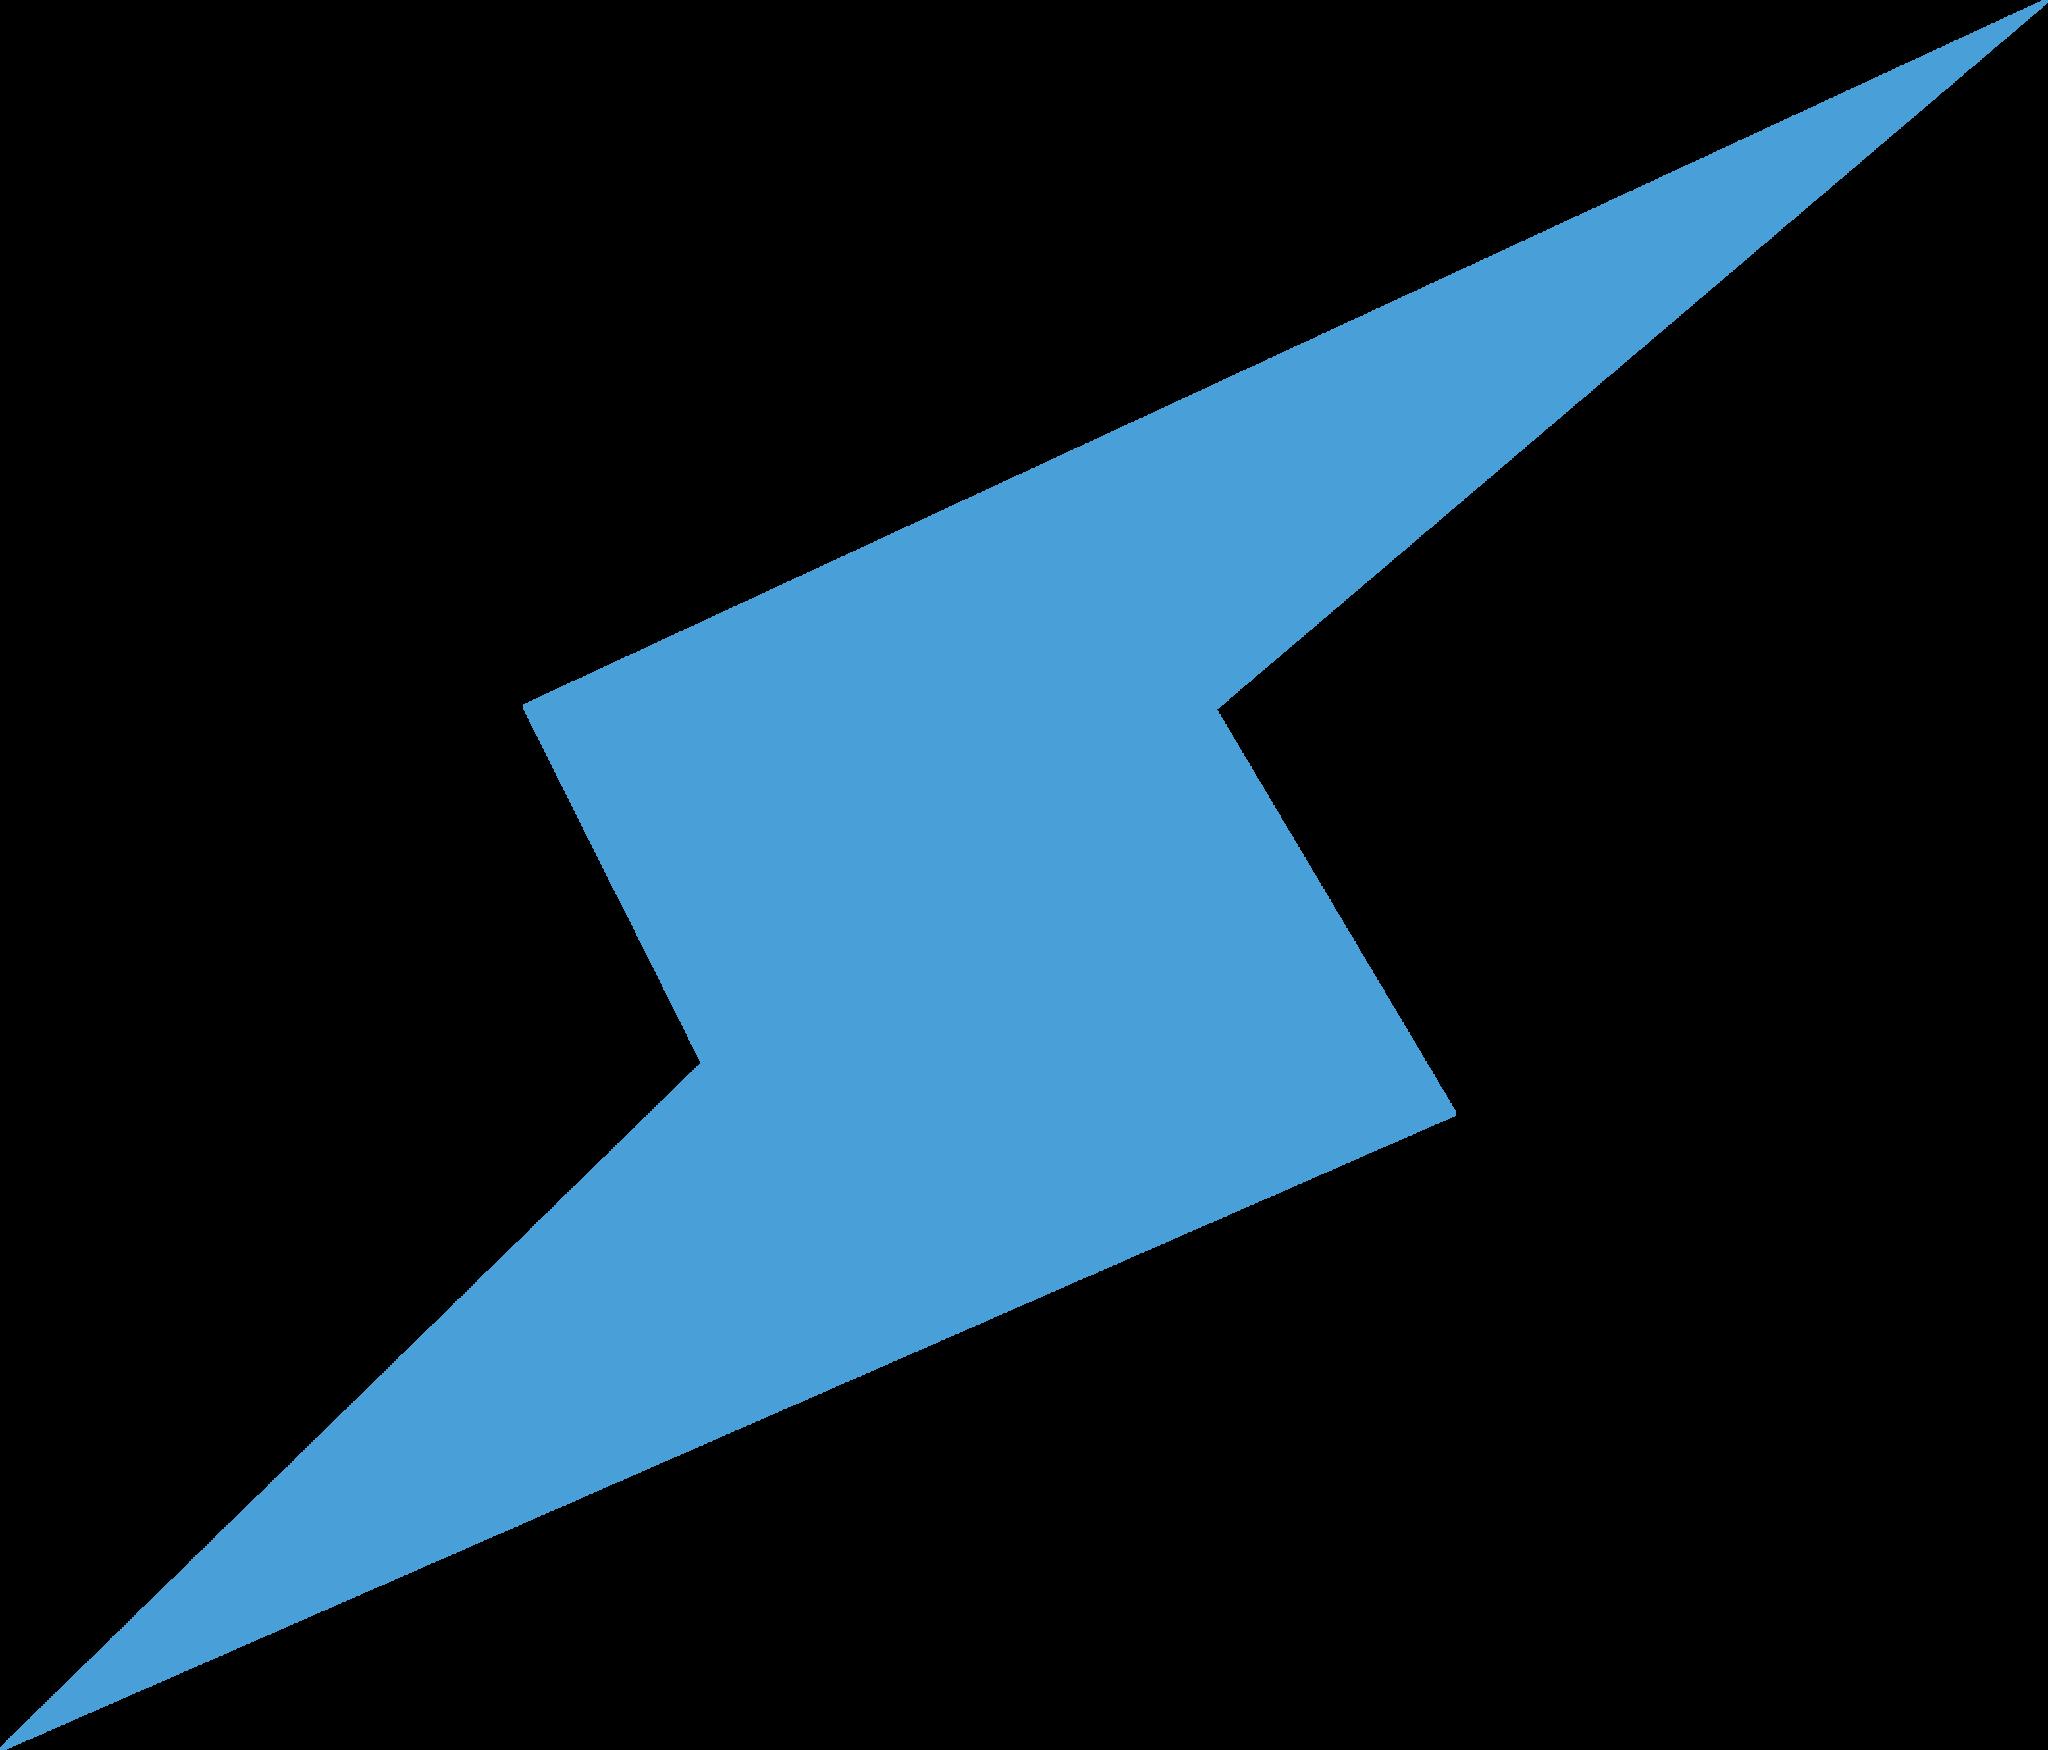 File:ScrewAttack blue bolt.png.